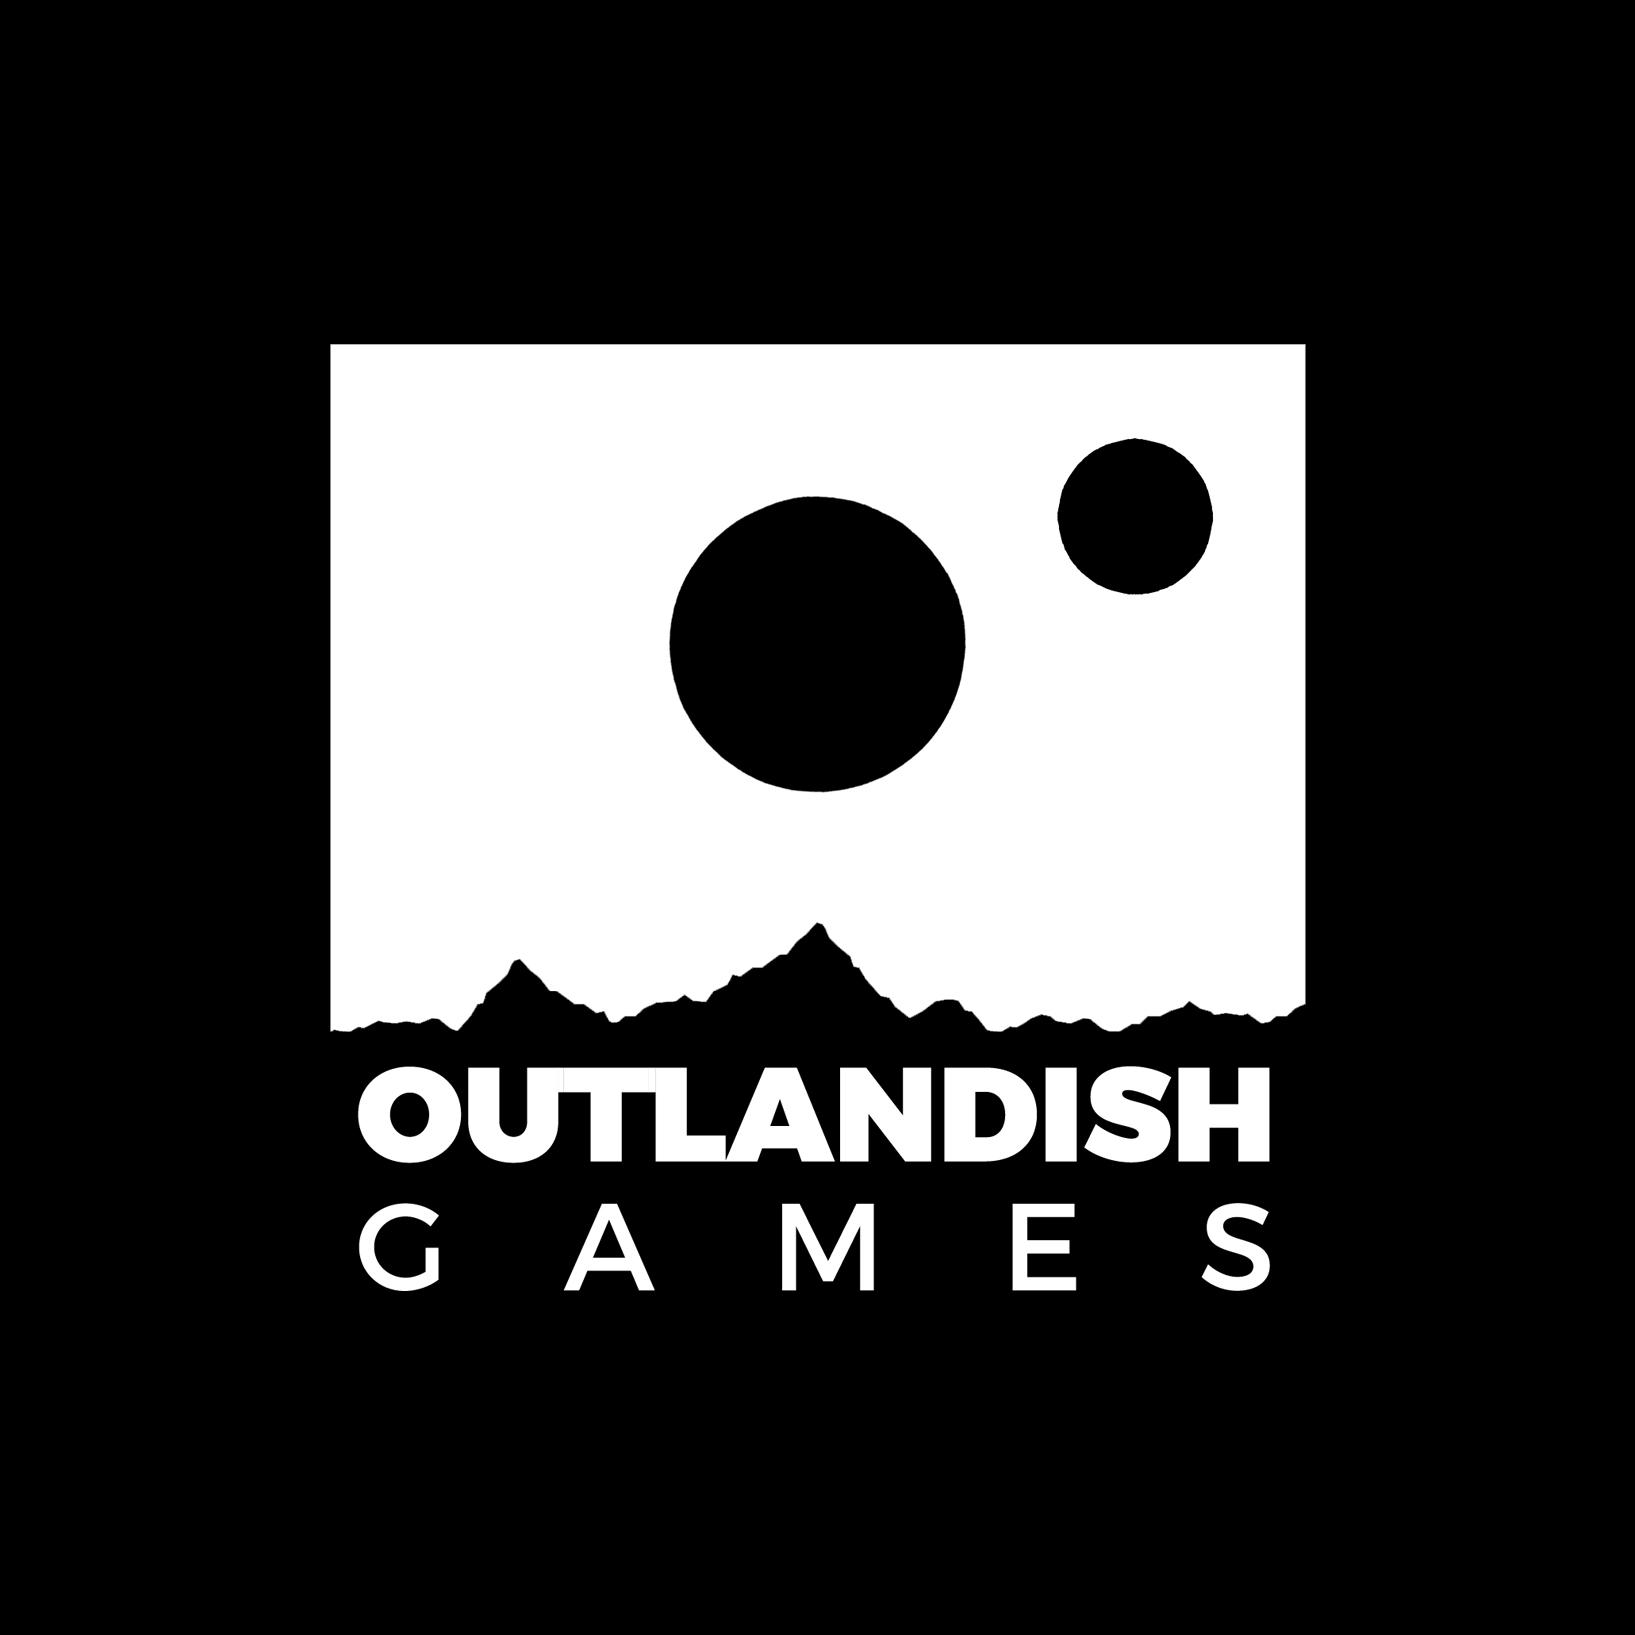 OUTLANDISH GAMES